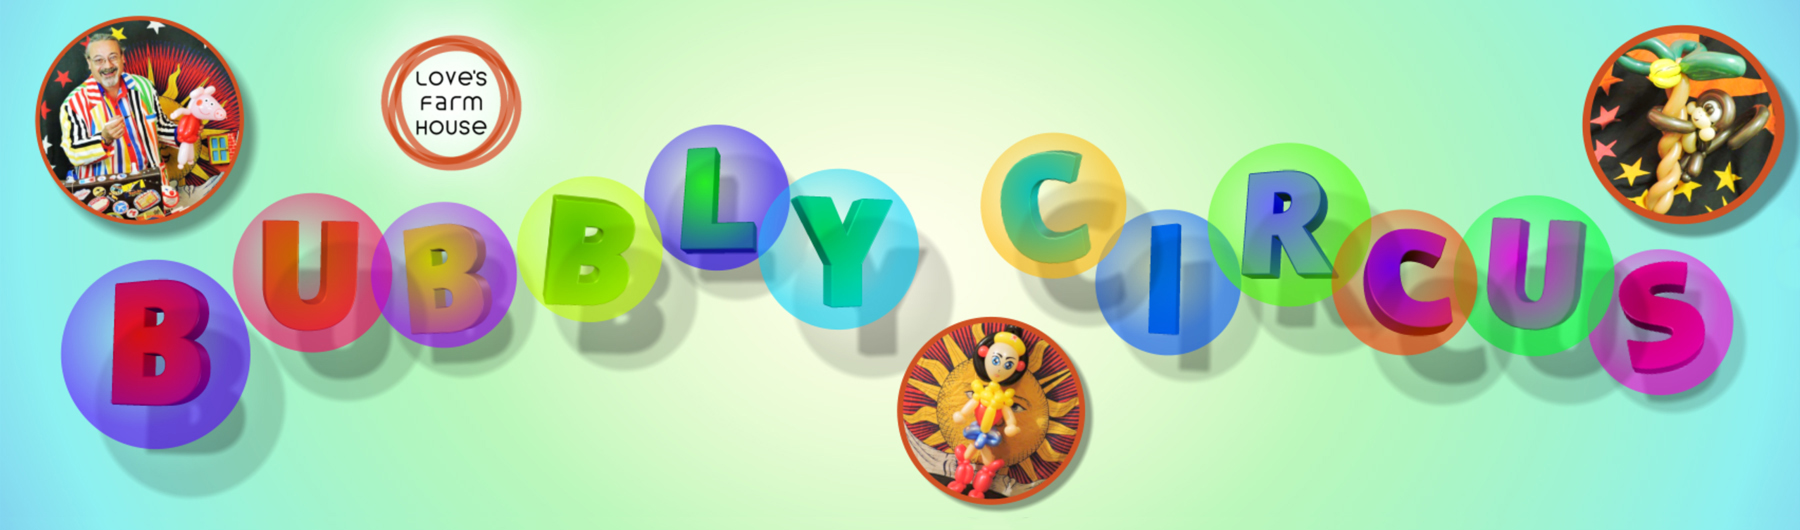 Bubbly Circus Magic & Balloon Modelling